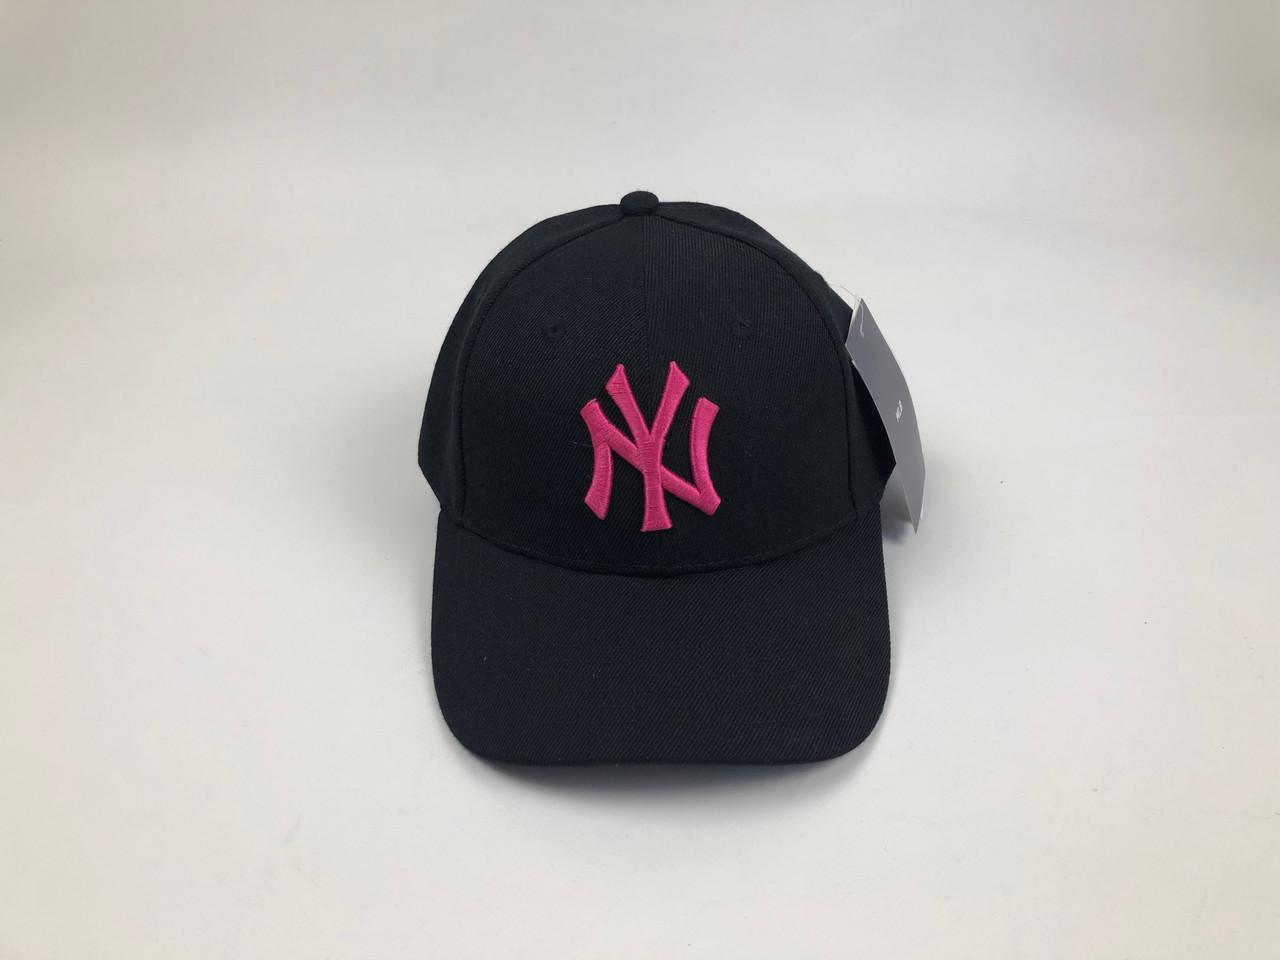 Кепка New York Yankees MLB - Черная с розовым лого